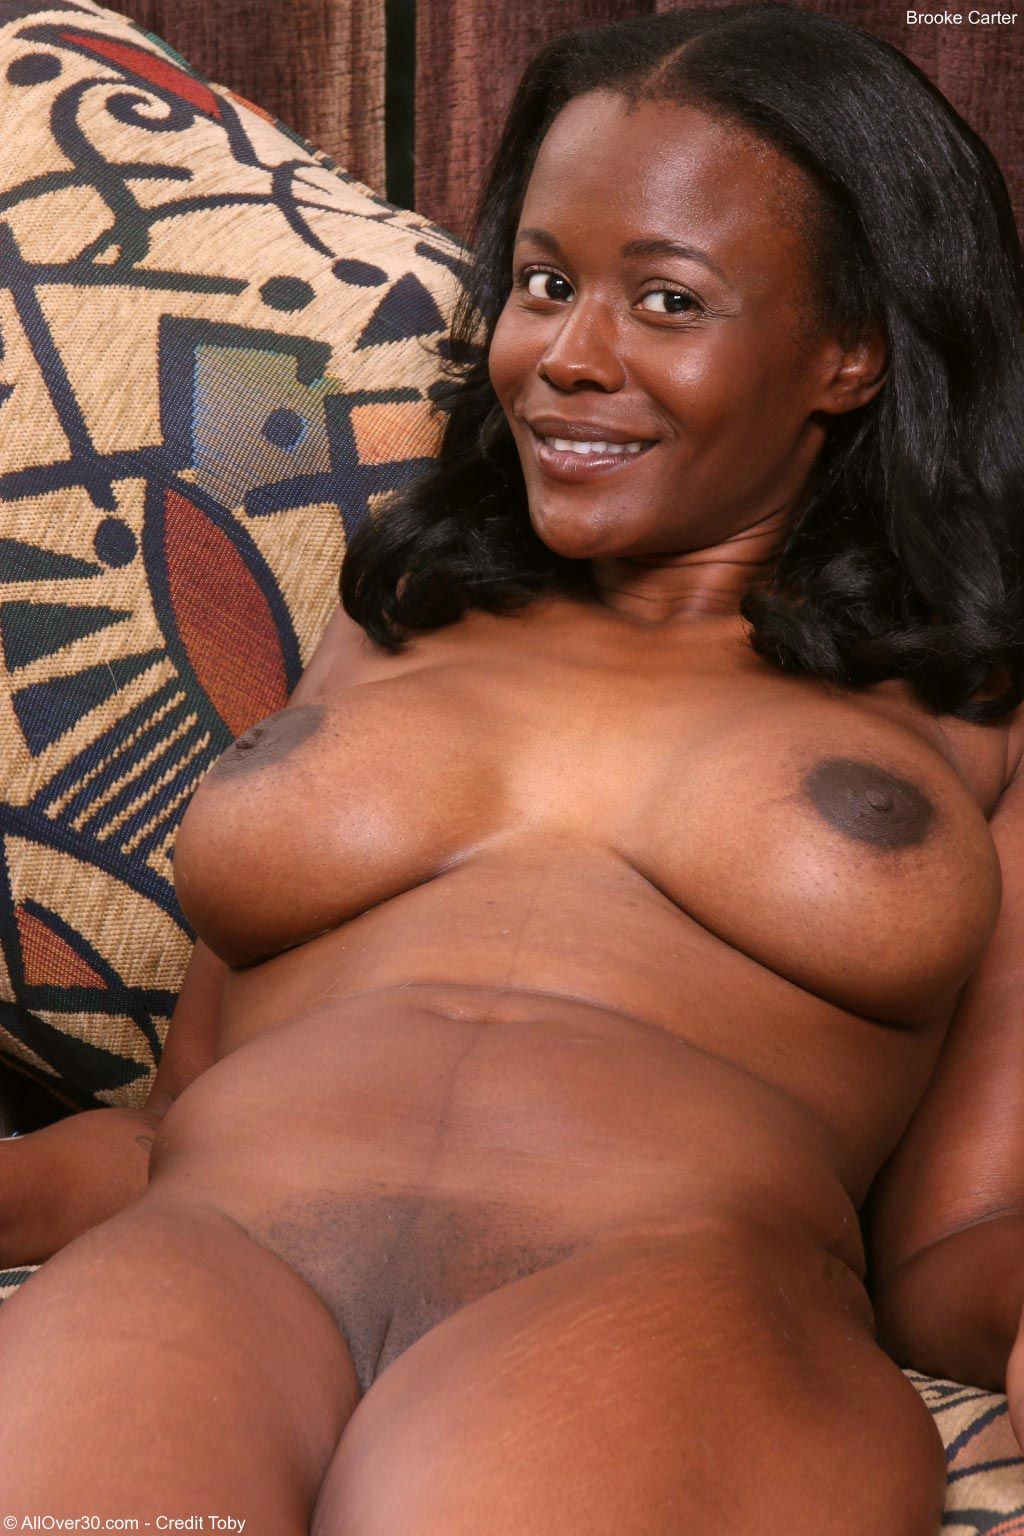 Brooke Carter Teases Her Ebony Pussy-5757